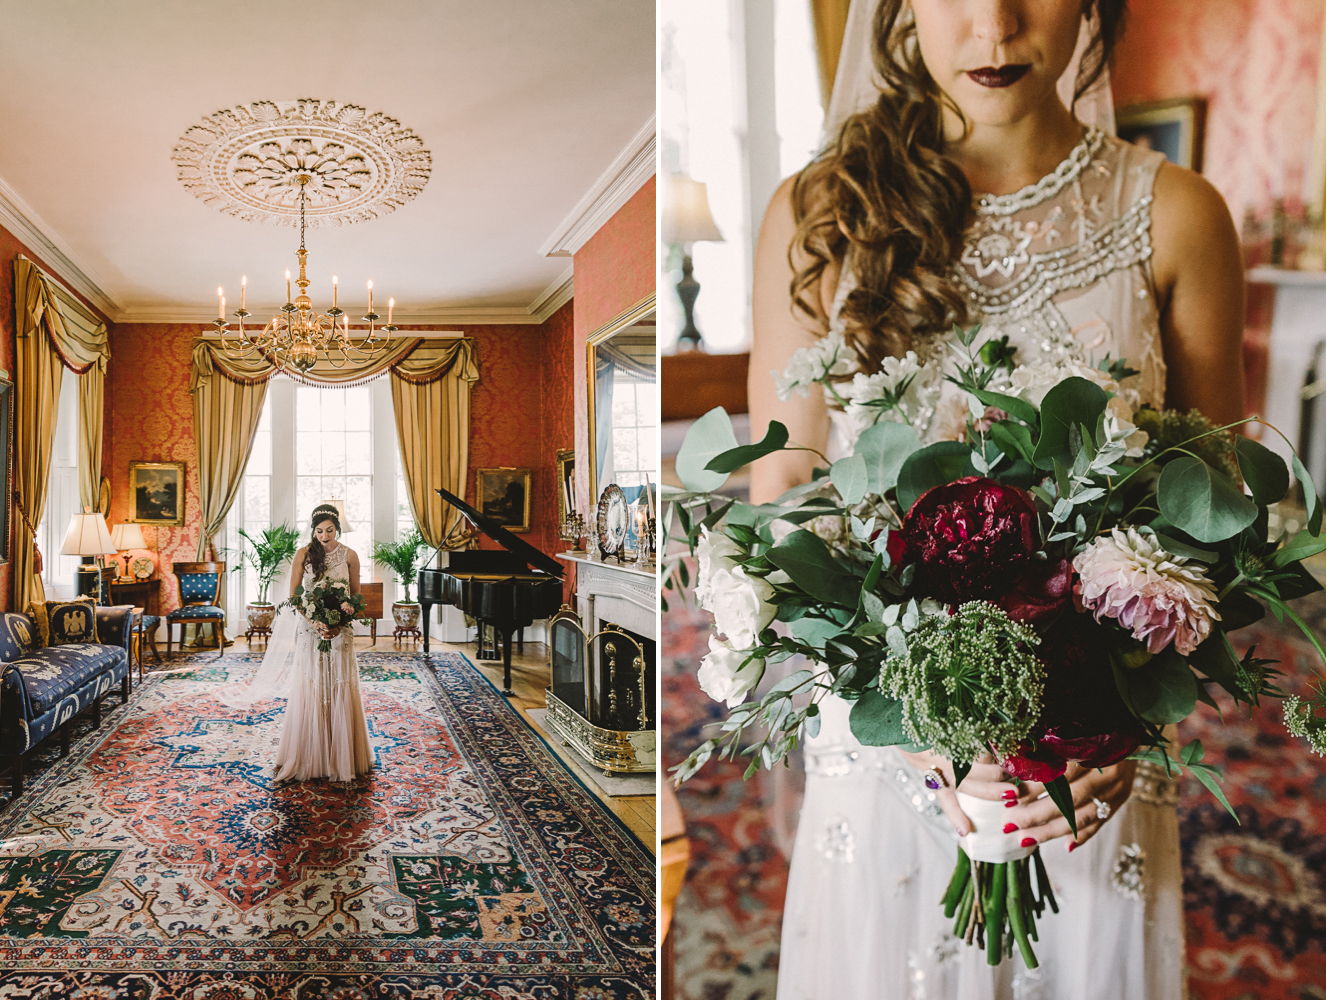 Barbara O Photography antrim 1844 wedding bridal party blush dresses5.jpg